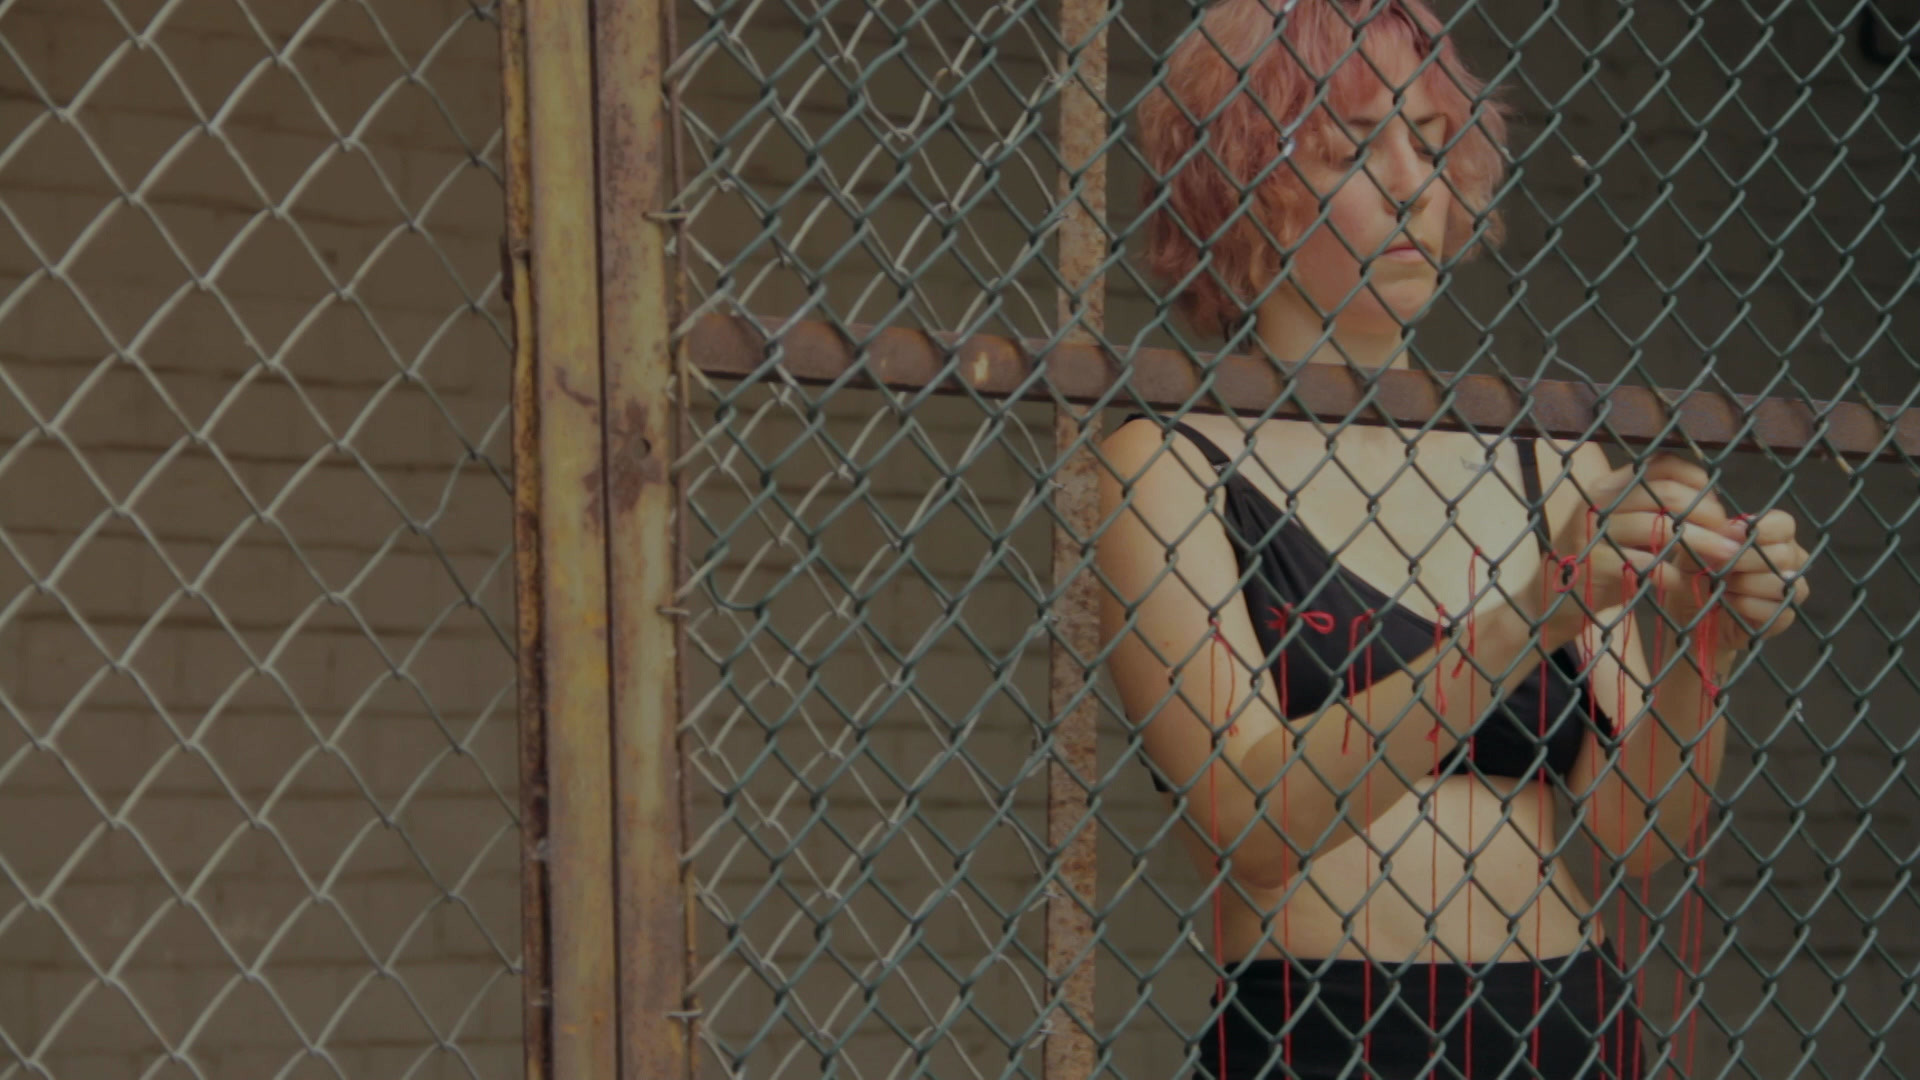 Sara Lu Performance MAMATOTO @HAUNT 22/08/2020 Filmcredits: Elissa de Brito